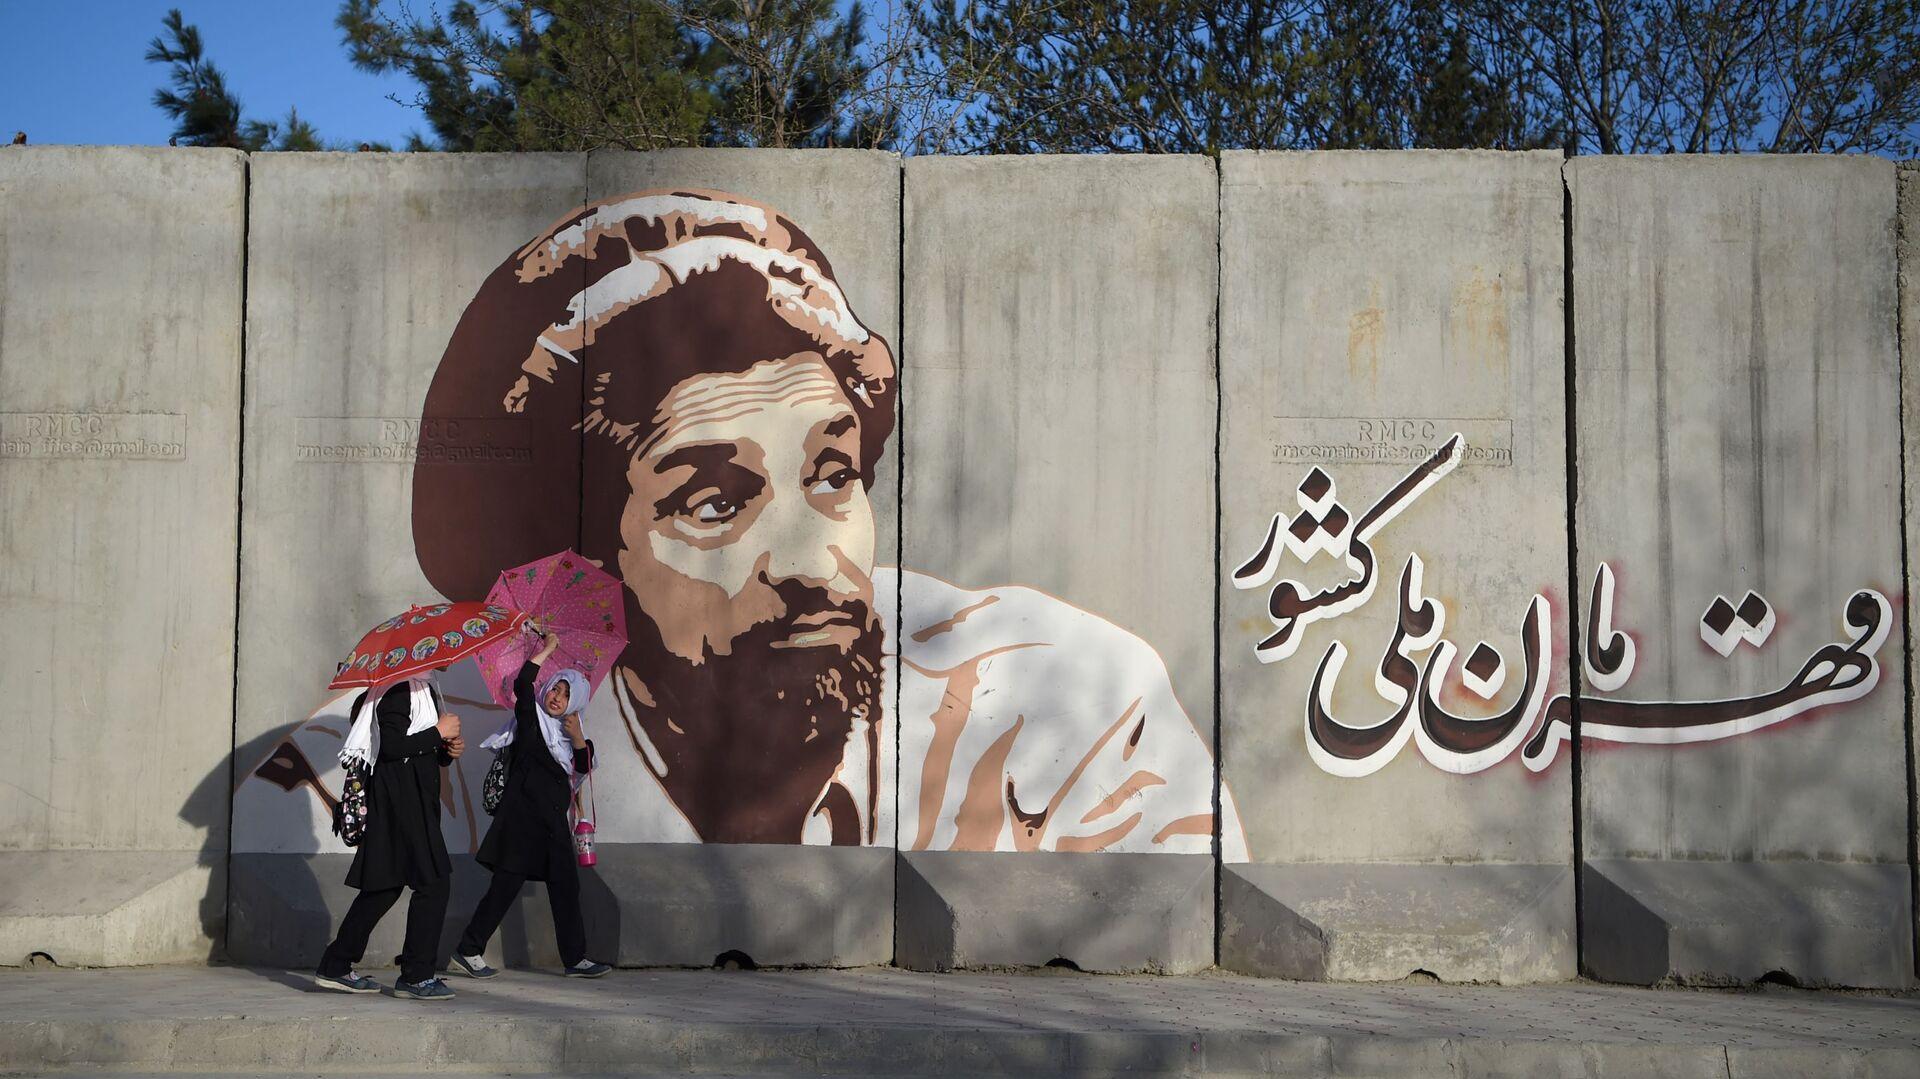 Школьницы идут по улице Кабула на фоне граффити с изображением Ахмада Шах Масуда - Sputnik Таджикистан, 1920, 13.09.2021